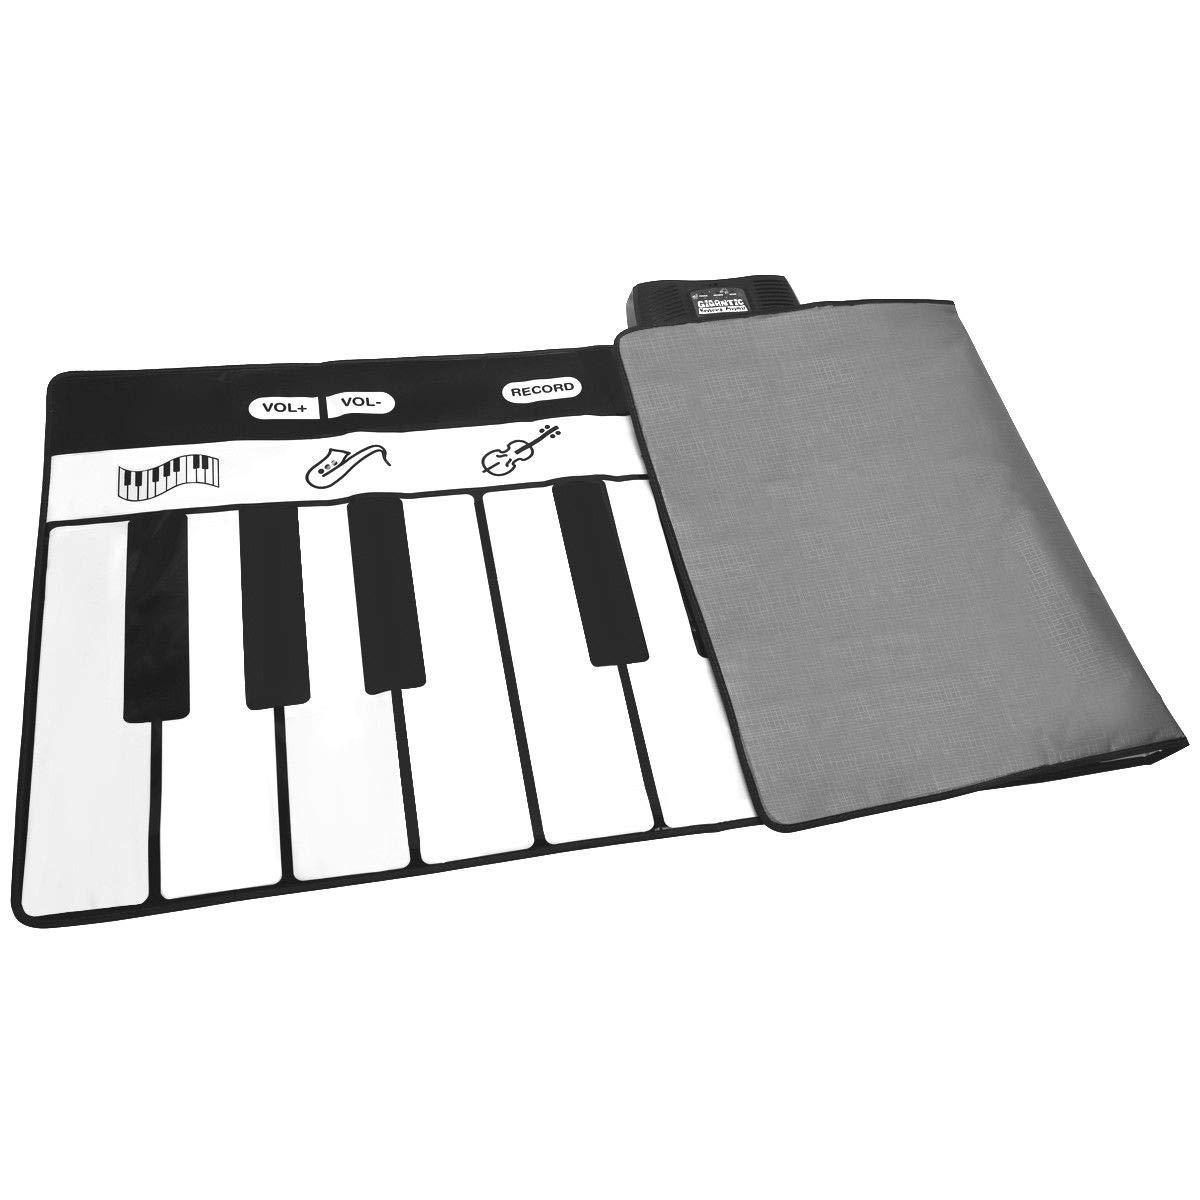 Dayanaprincess New Kids 24 Key Gigantic Piano Keyboard with 8 Instrument Settings Learning Children Play Set Fun Entertaining Book Melody by Dayanaprincess (Image #7)